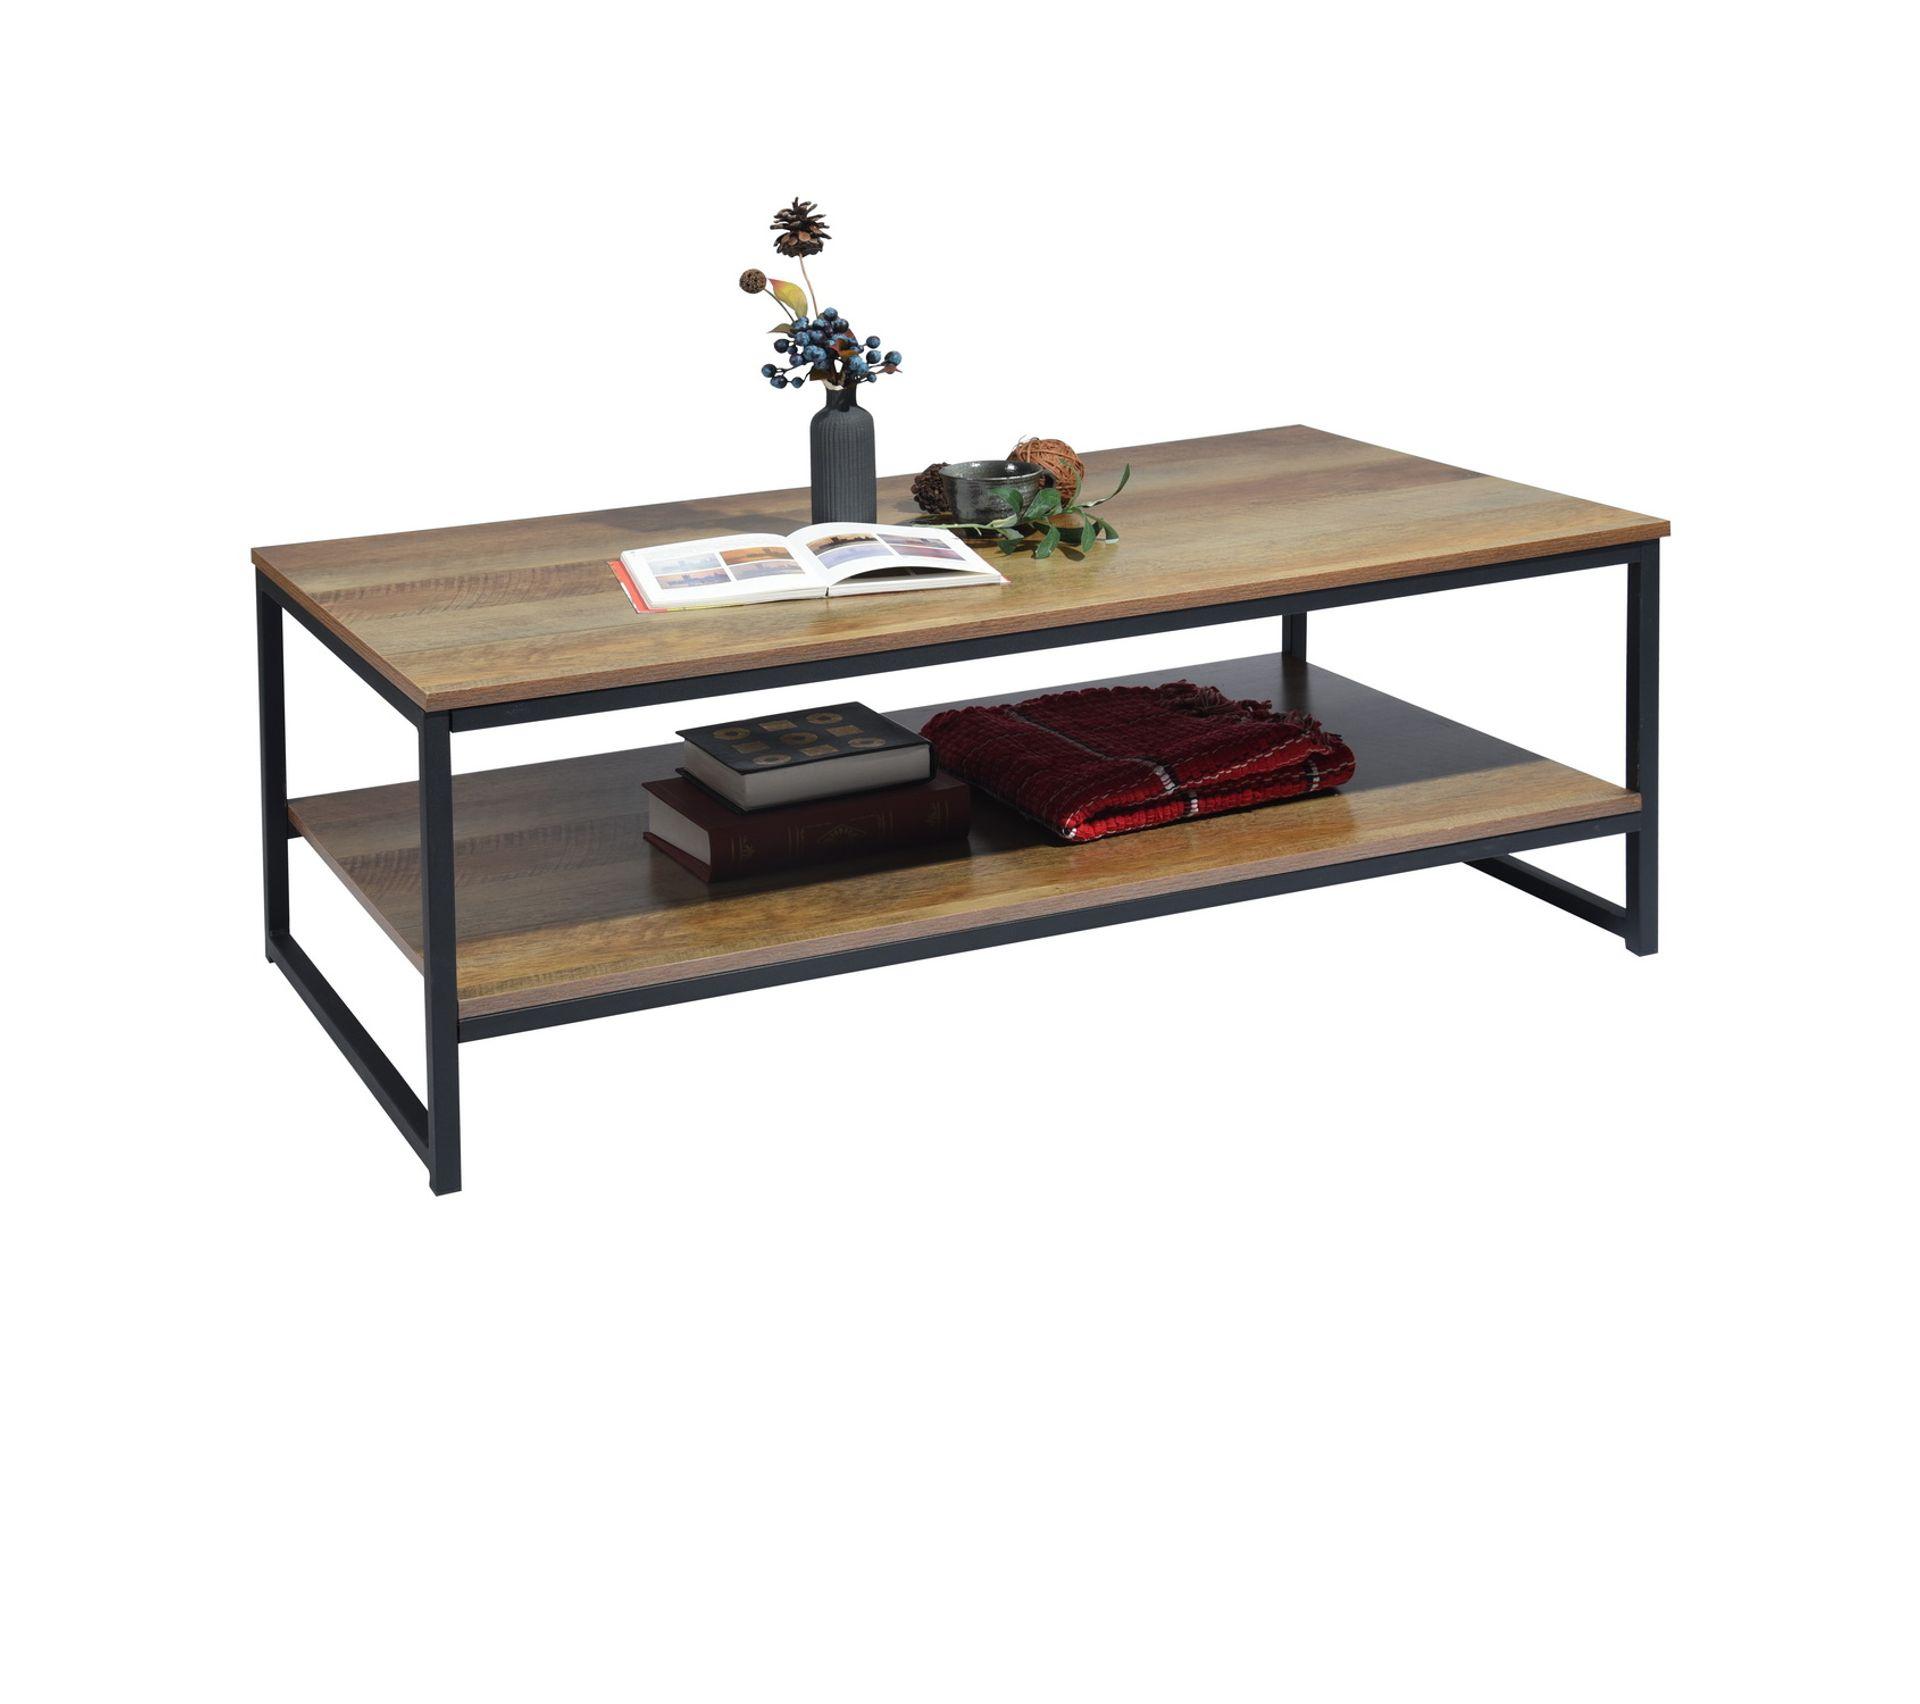 Table Basse Rectangulaire 2 Couches Bois Fonce Noir Table Basse But